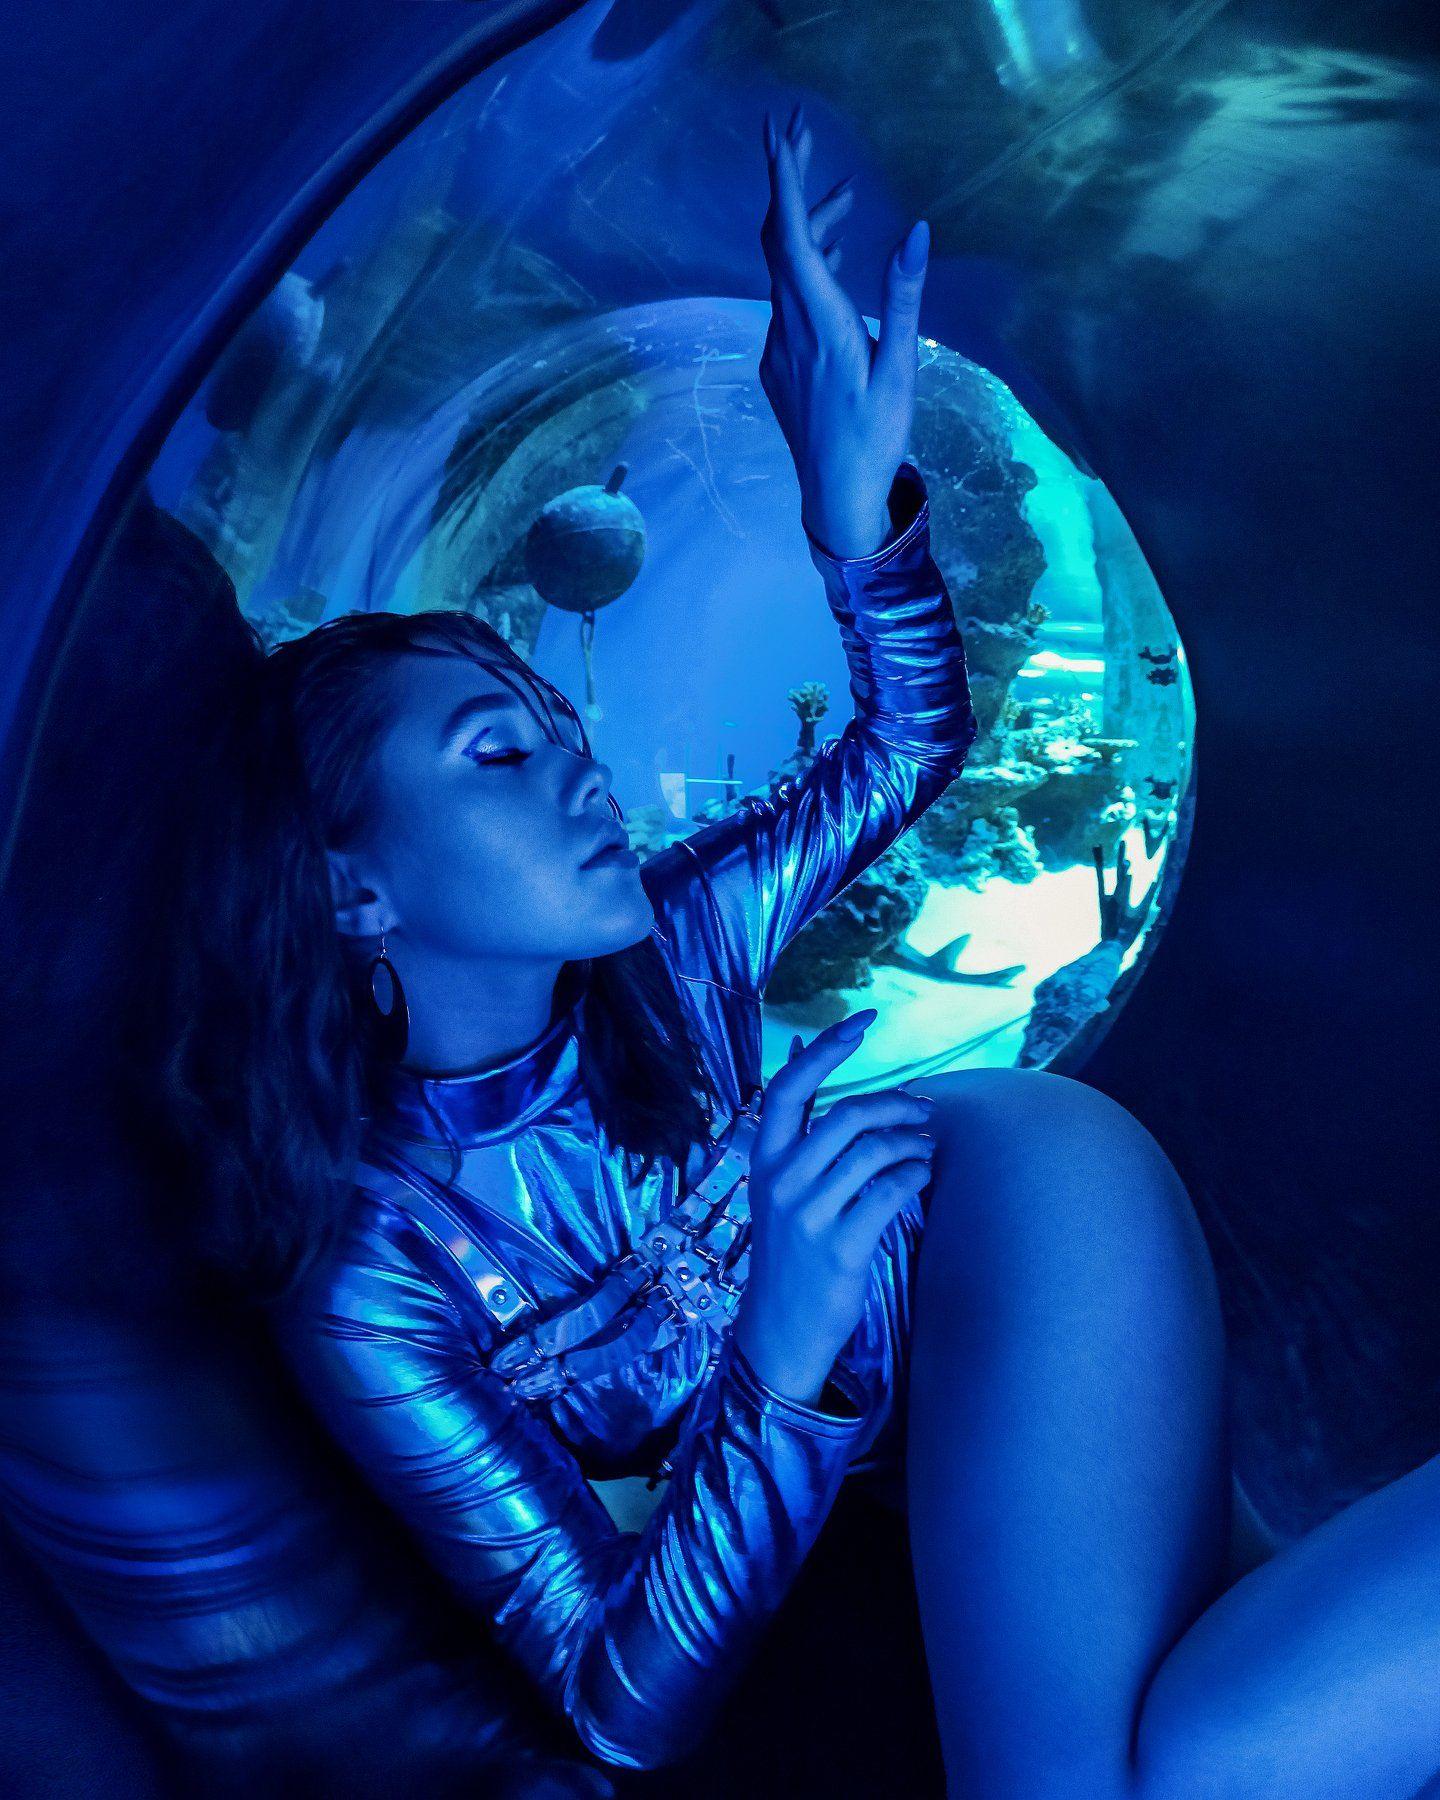 fine art, under water, blue, space, portrait, woman, портрет, под водой, синий, девушка, космос, Семёхина Марина